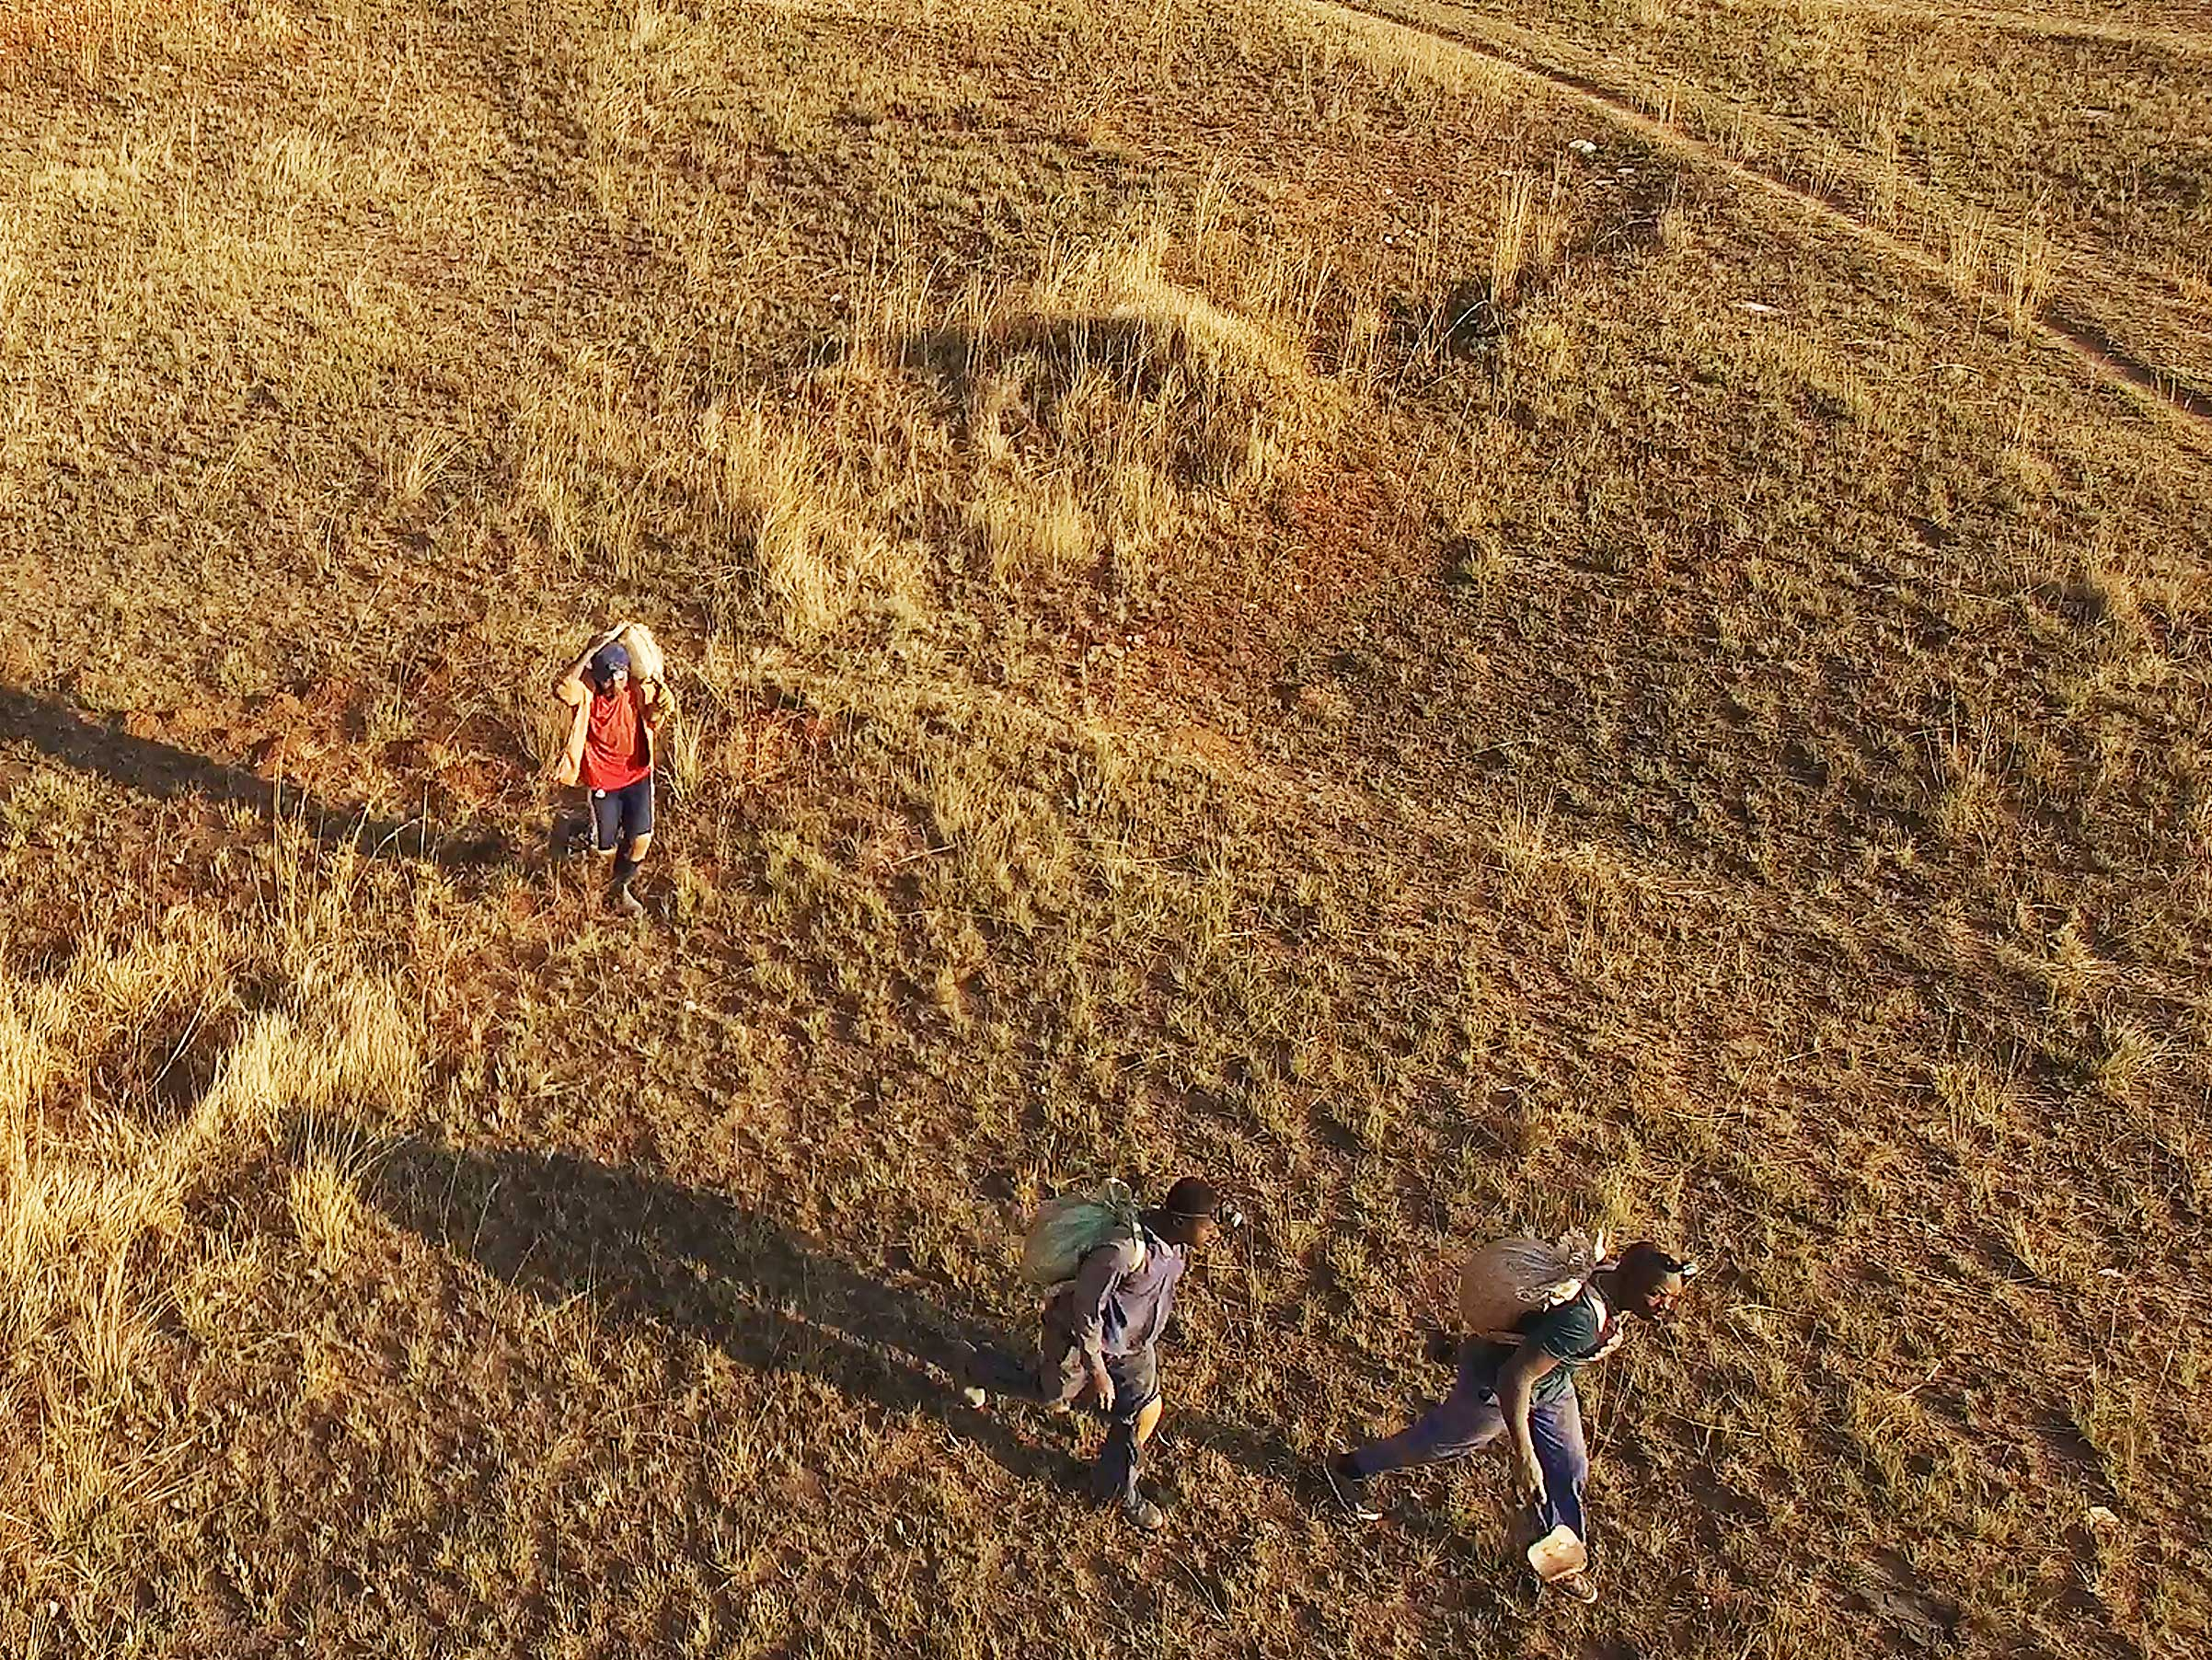 The Gamblers: The Zama Zama Miners of Southern Africa